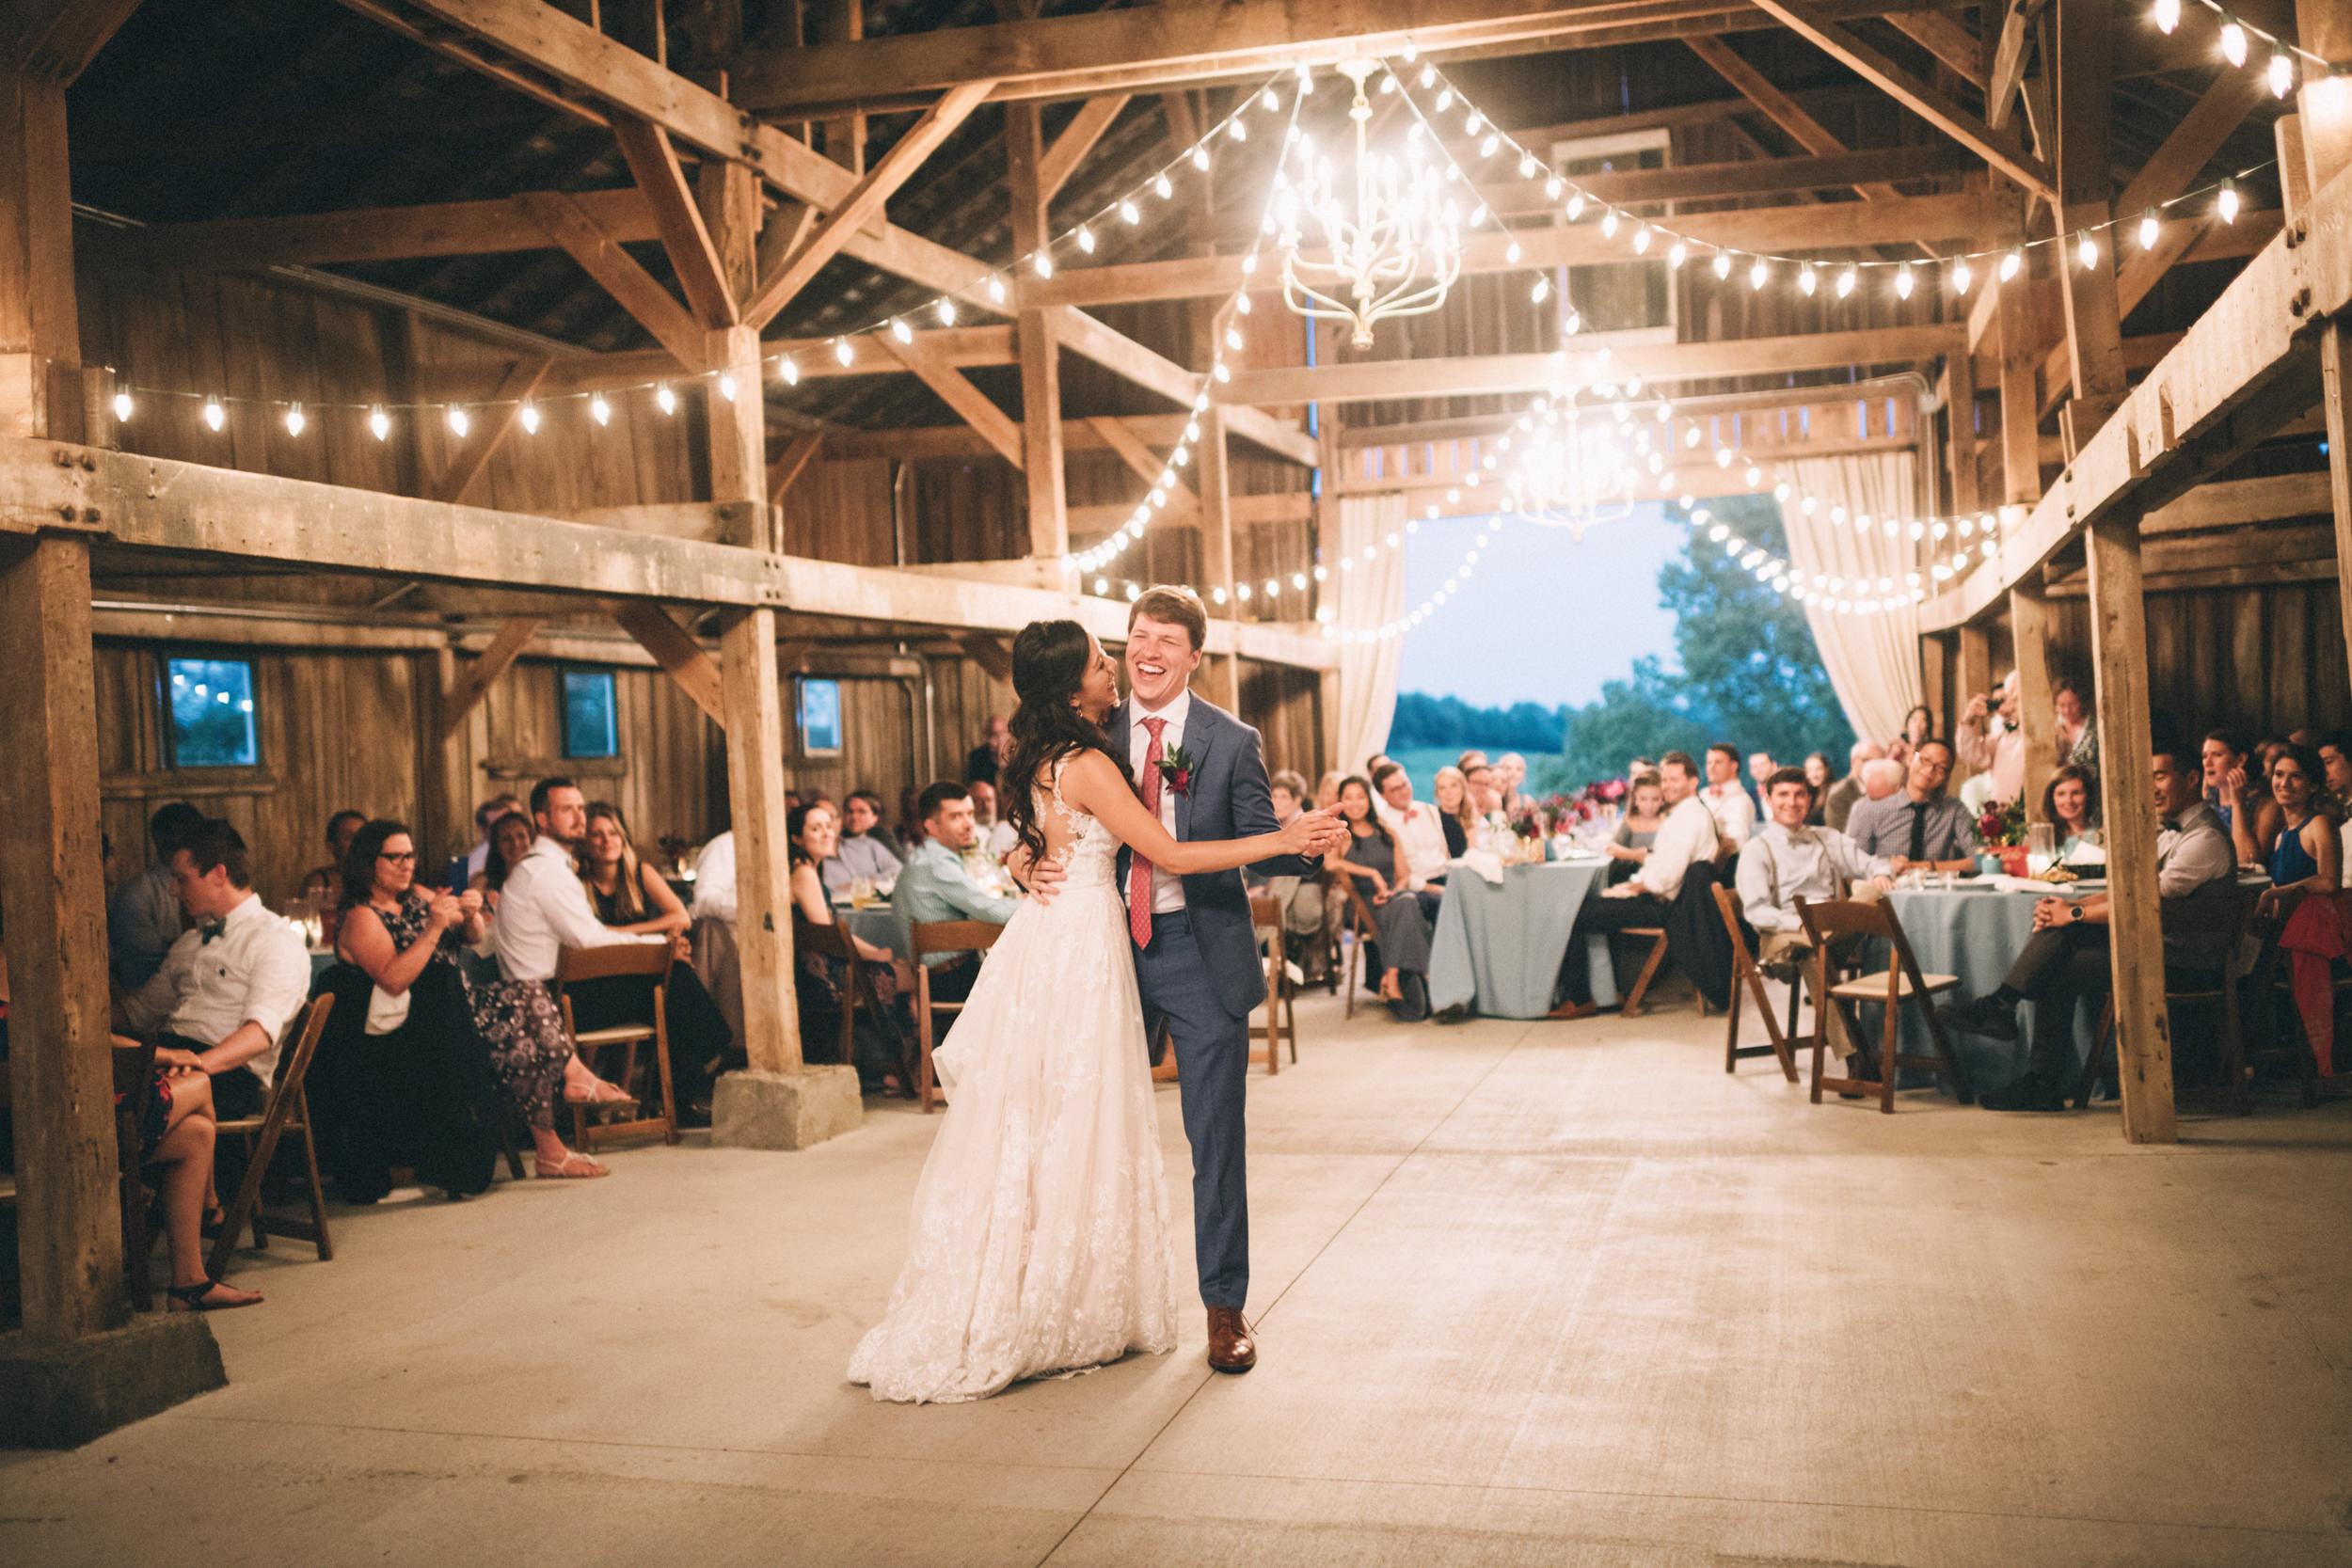 Louisville-Kentucky-Wedding-and-Elopement-Photographer-Sarah-Katherine-Davis-Photography-Summer-Jewel-Toned-Wedding-Chineese-Tea-Ceremony-Warrenwood-Manor-Danville-906.jpg